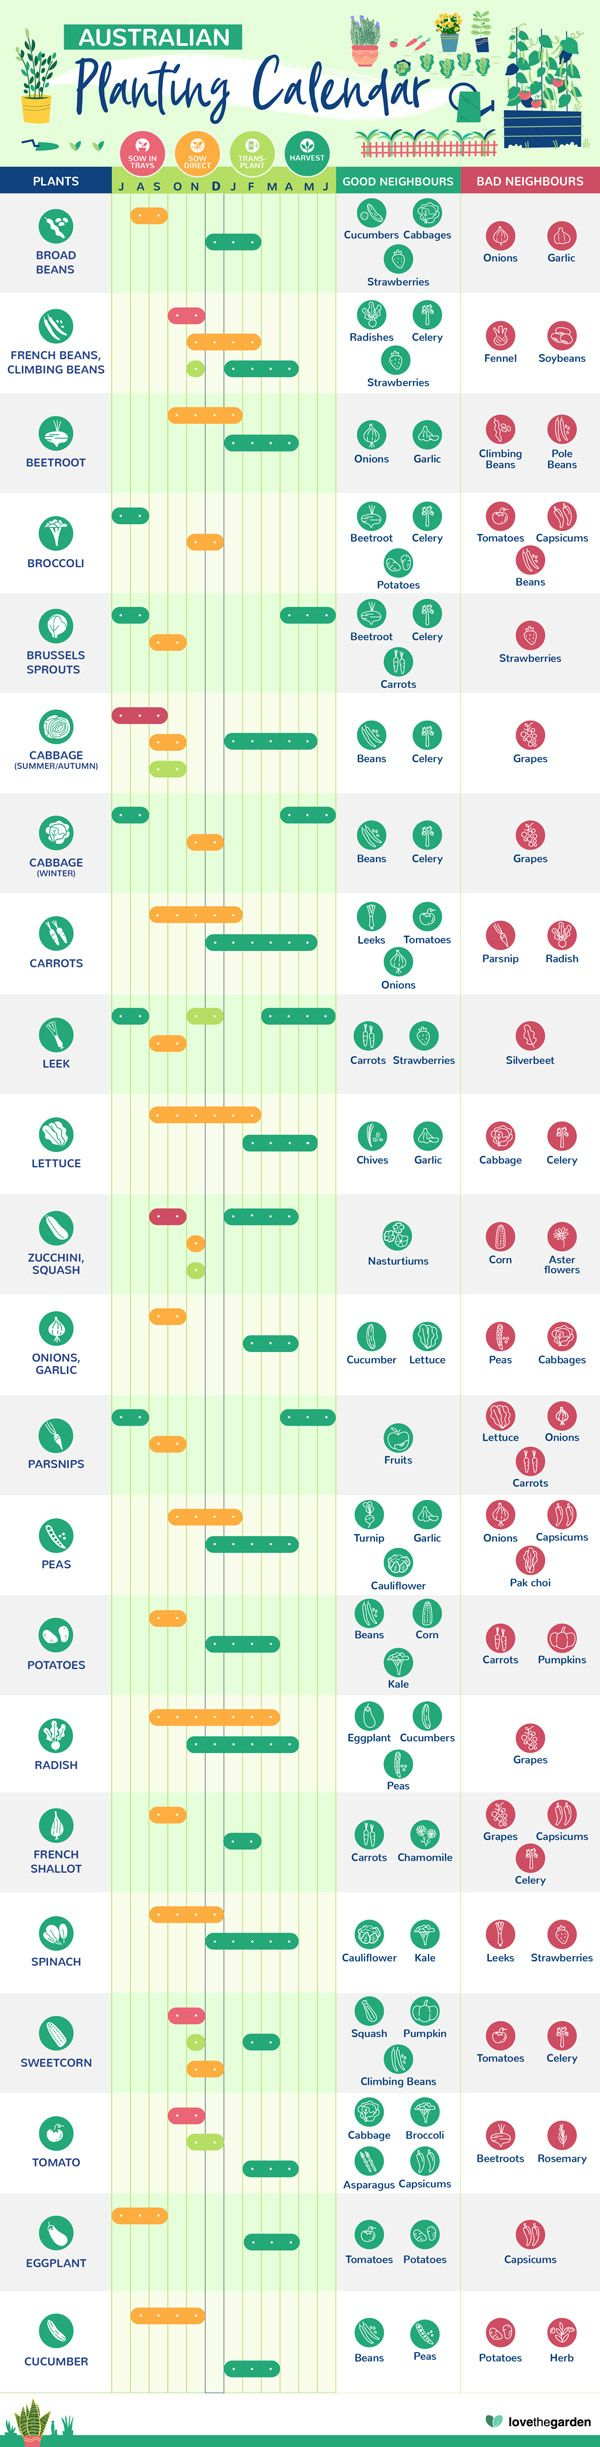 Planting Calendar Infographic In 2021 Planting Calendar What To Plant When Garden Calendar